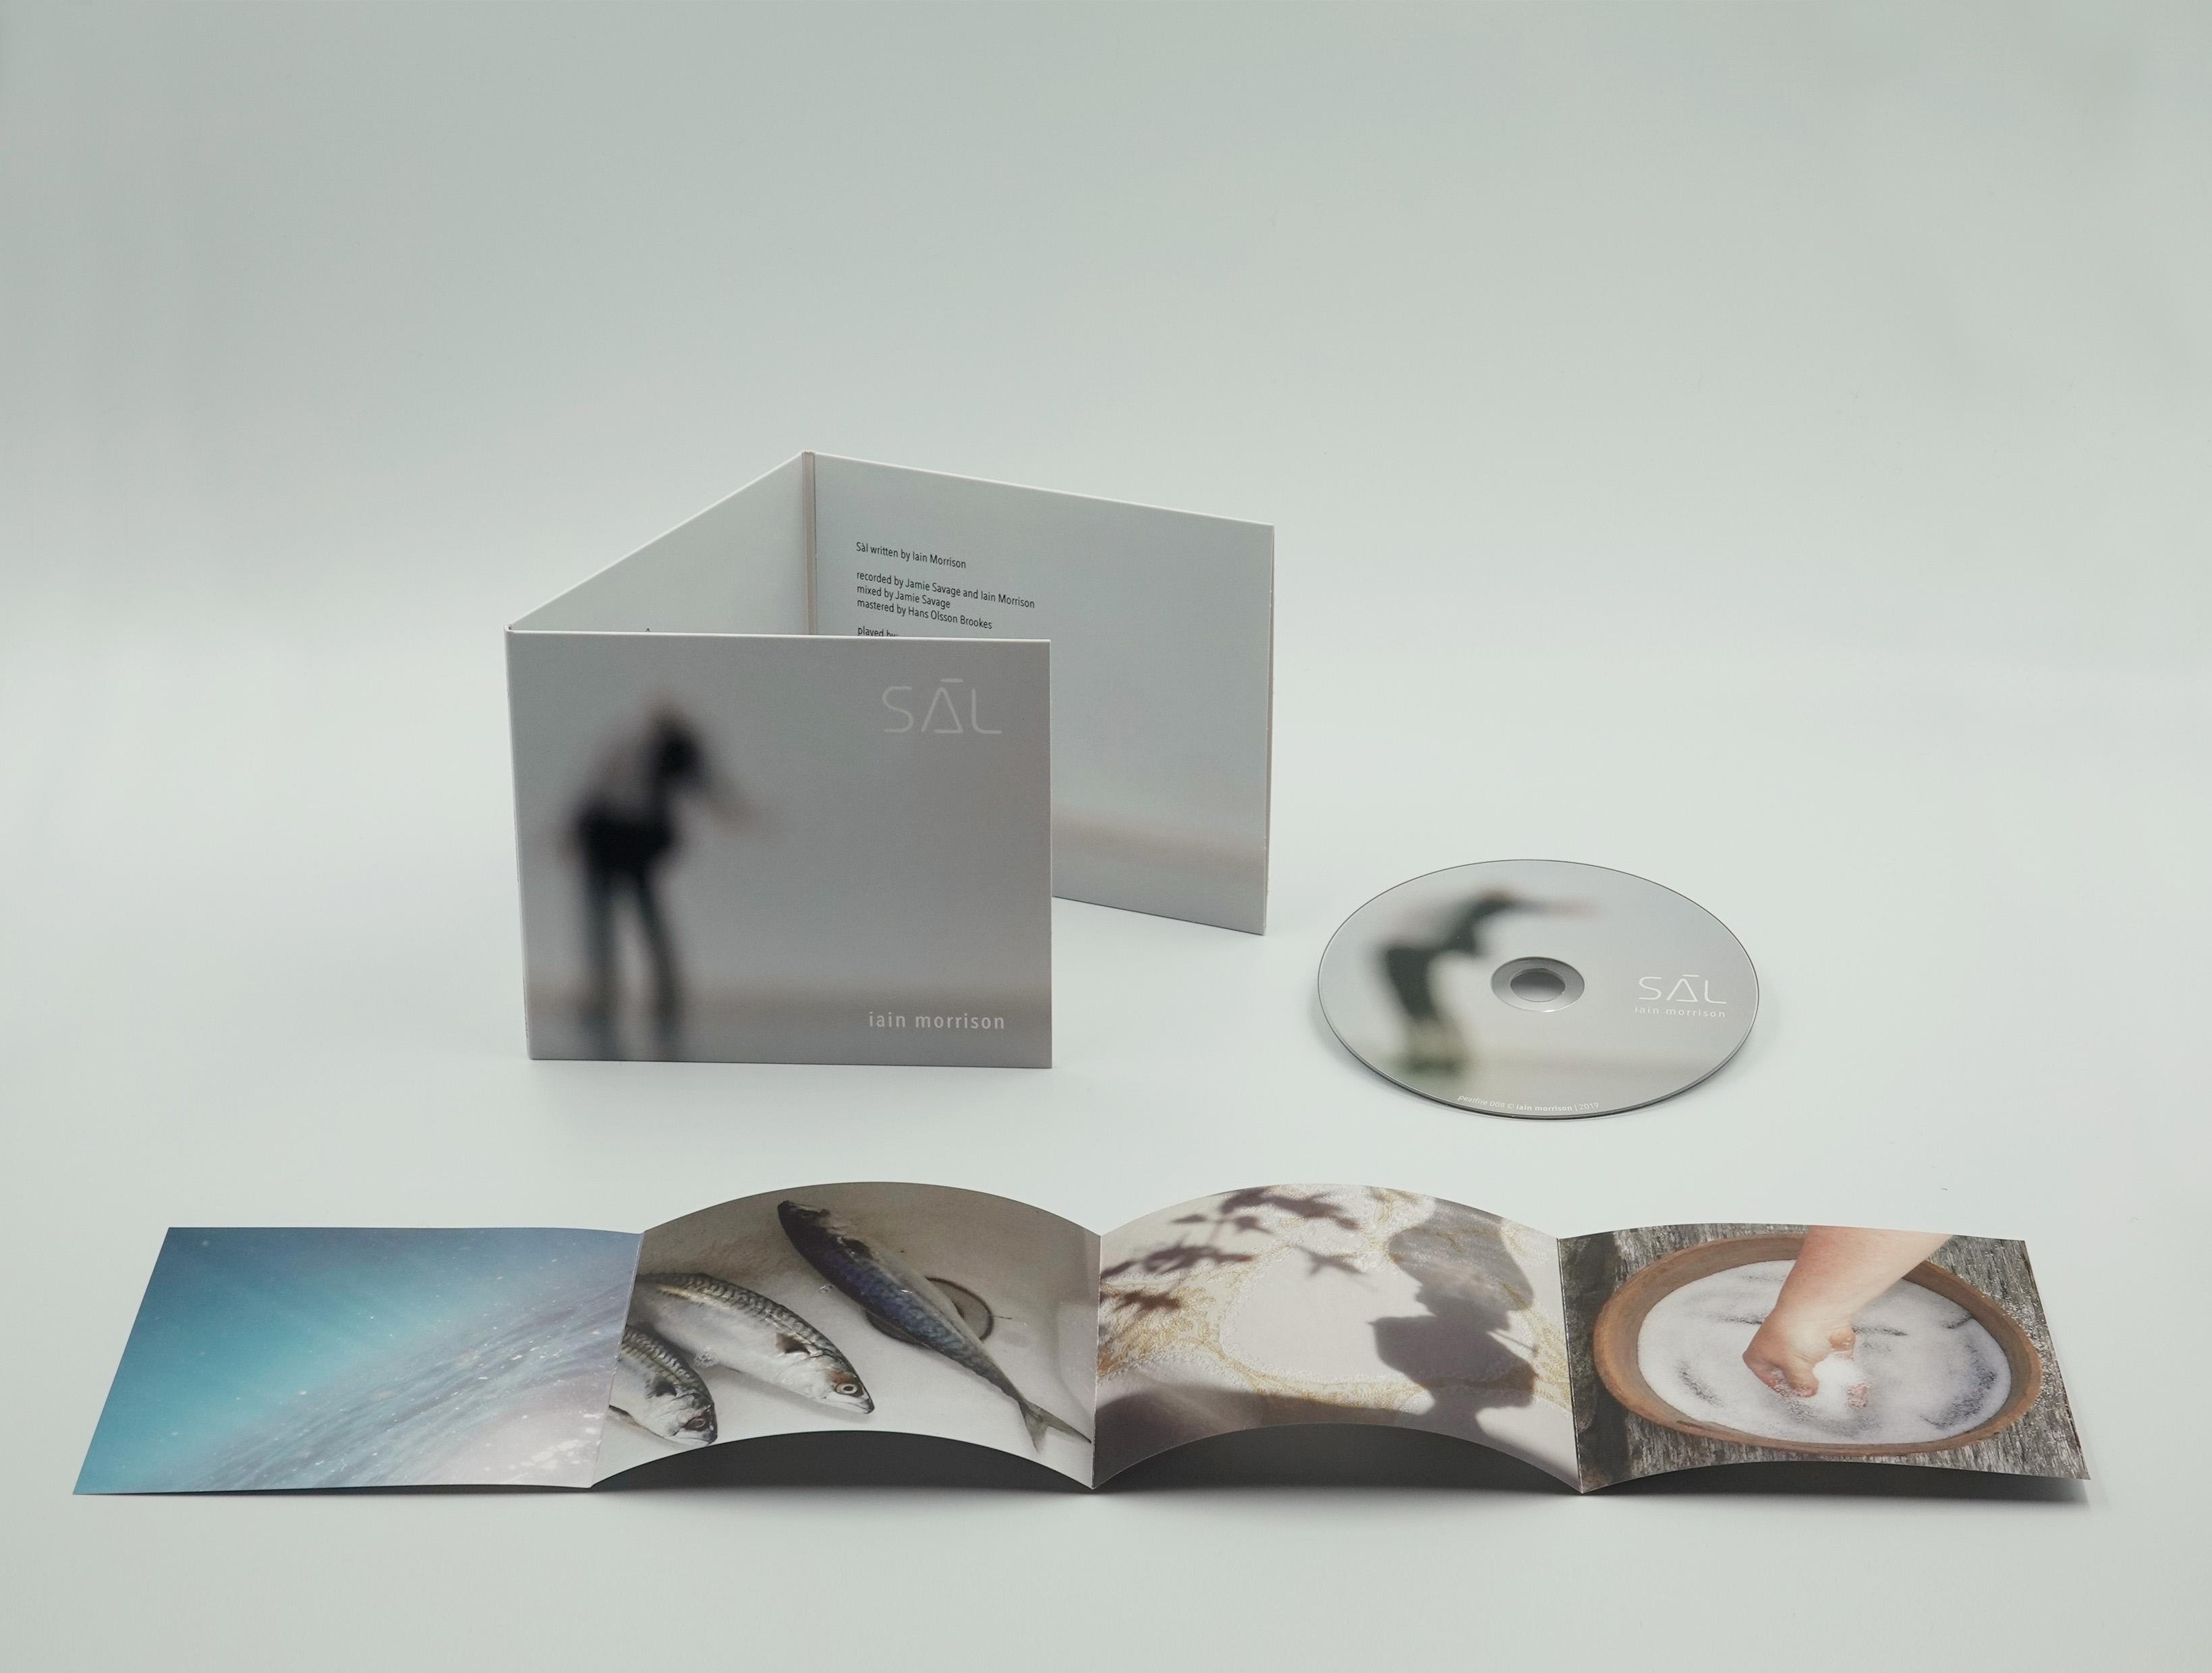 Sàl Cd Promo Image